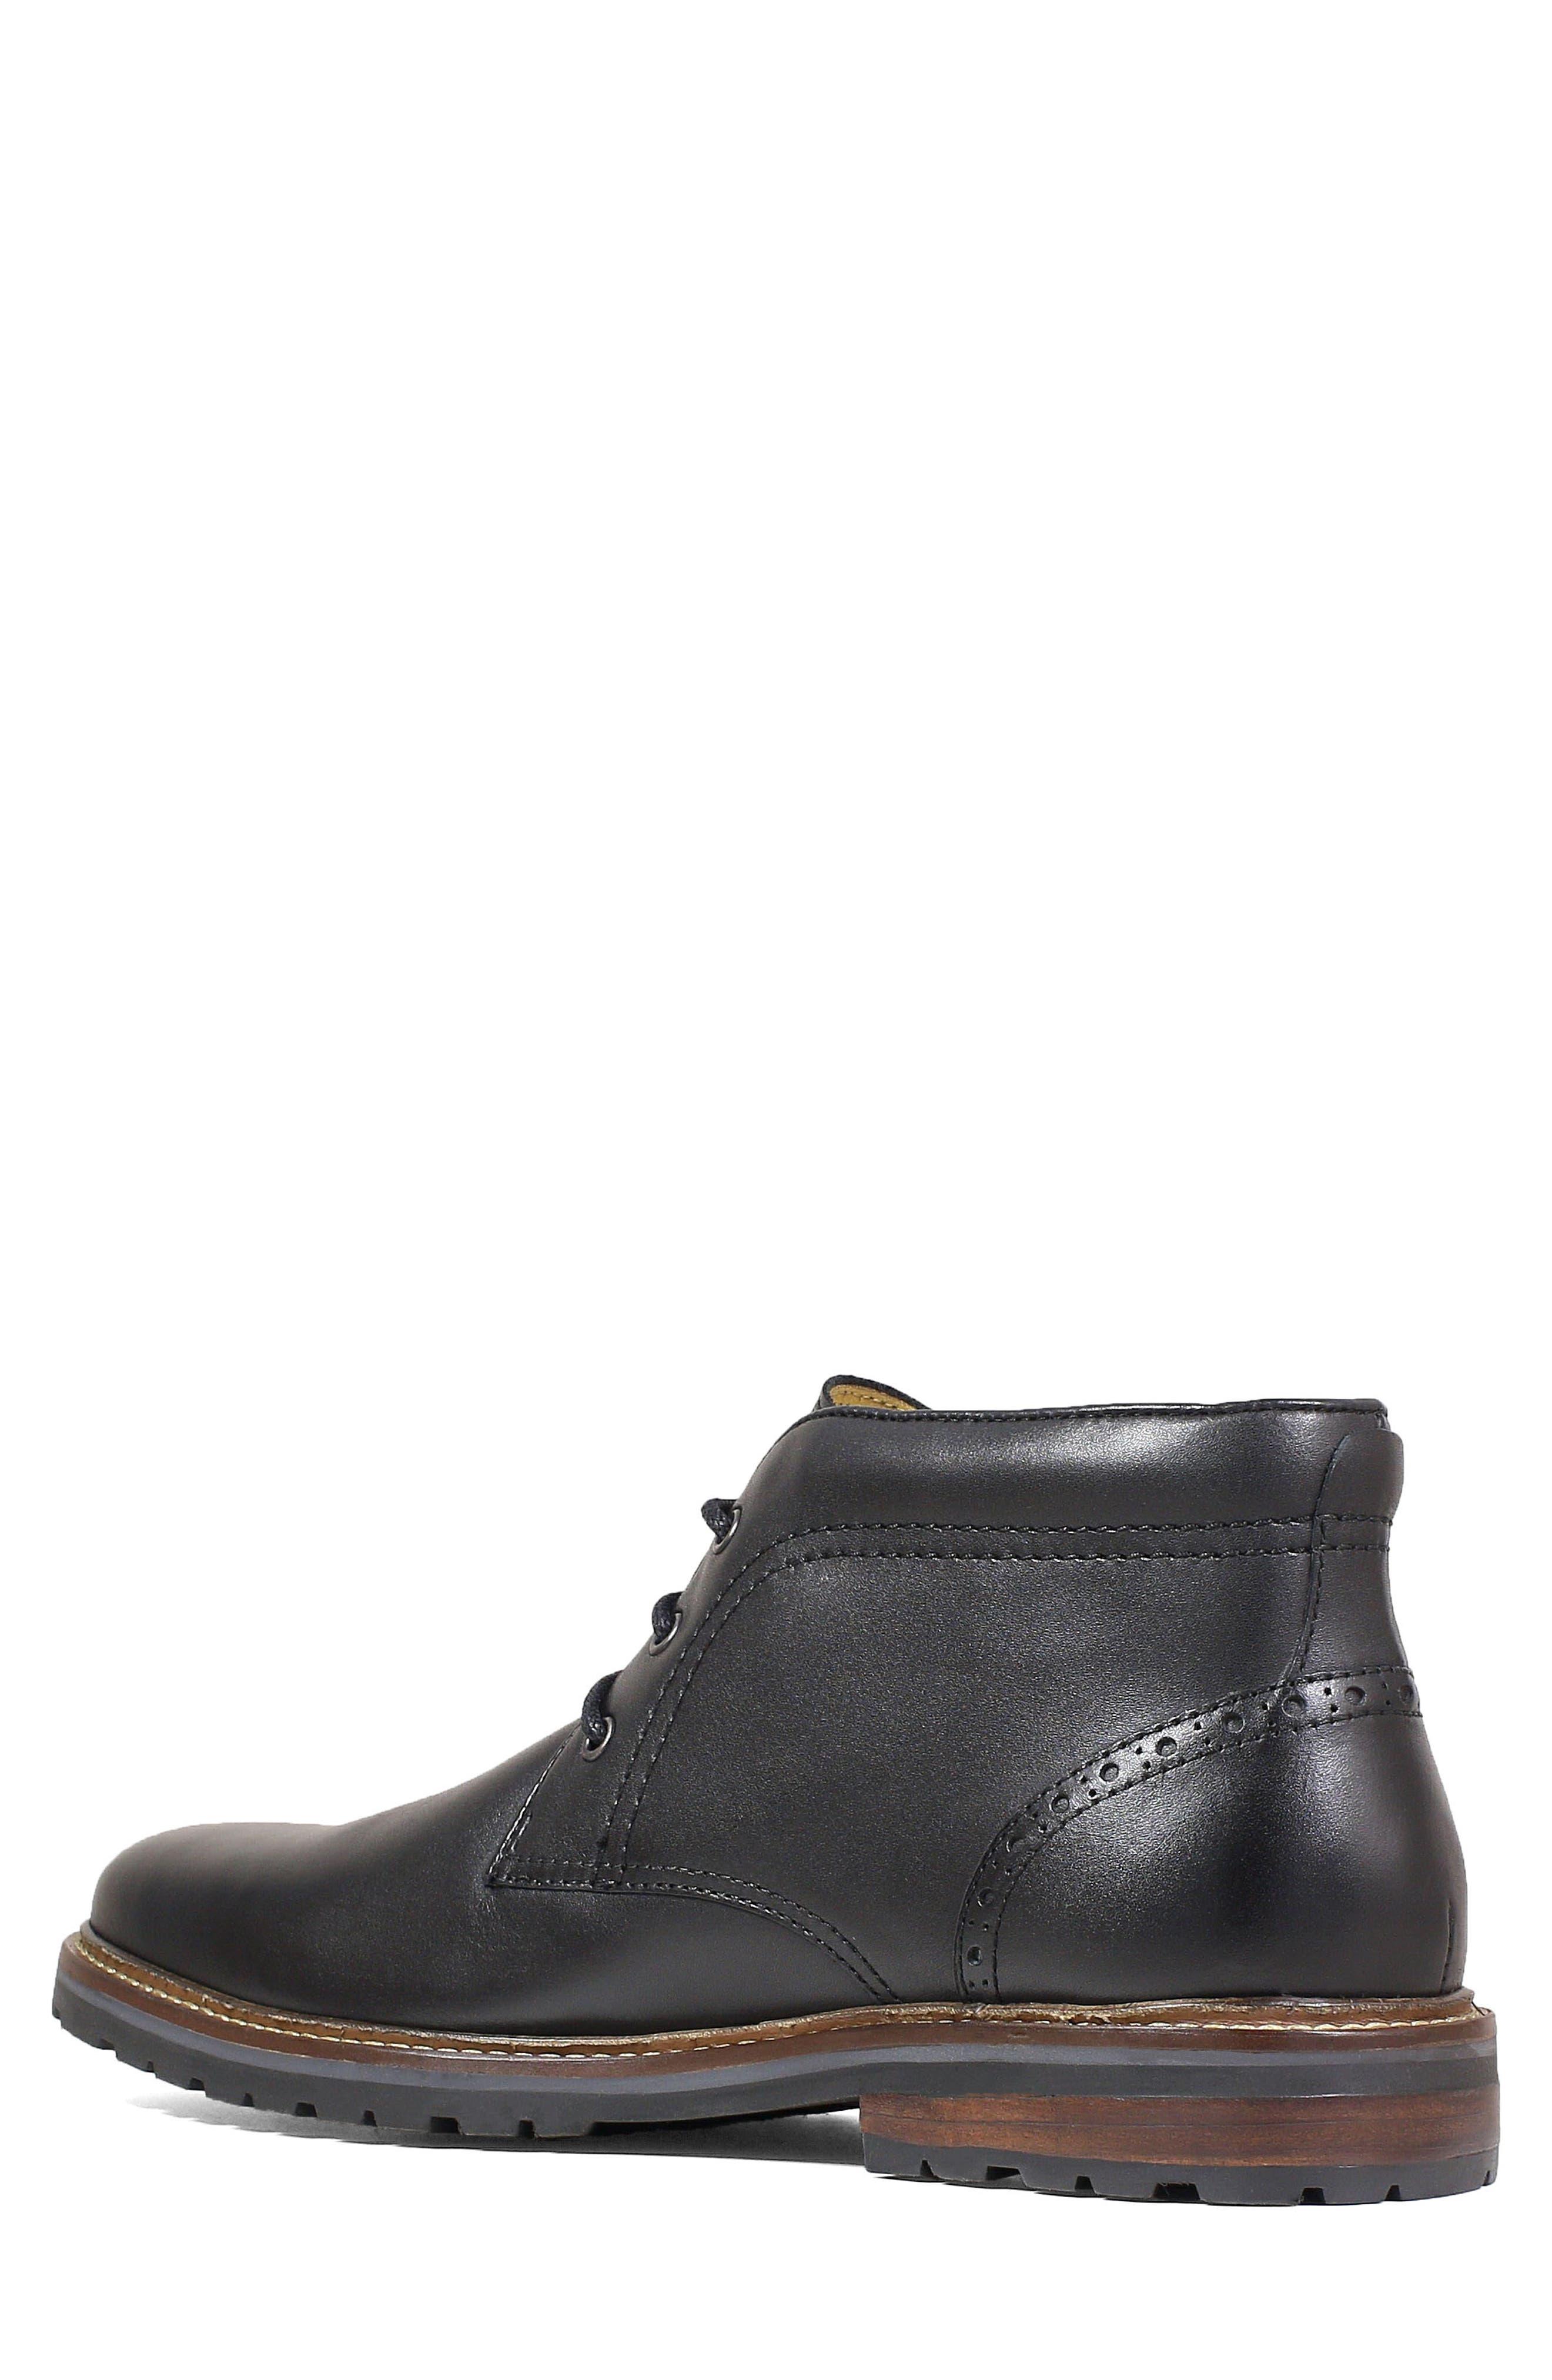 FLORSHEIM, Estabrook Lugged Chukka Boot, Alternate thumbnail 2, color, BLACK LEATHER